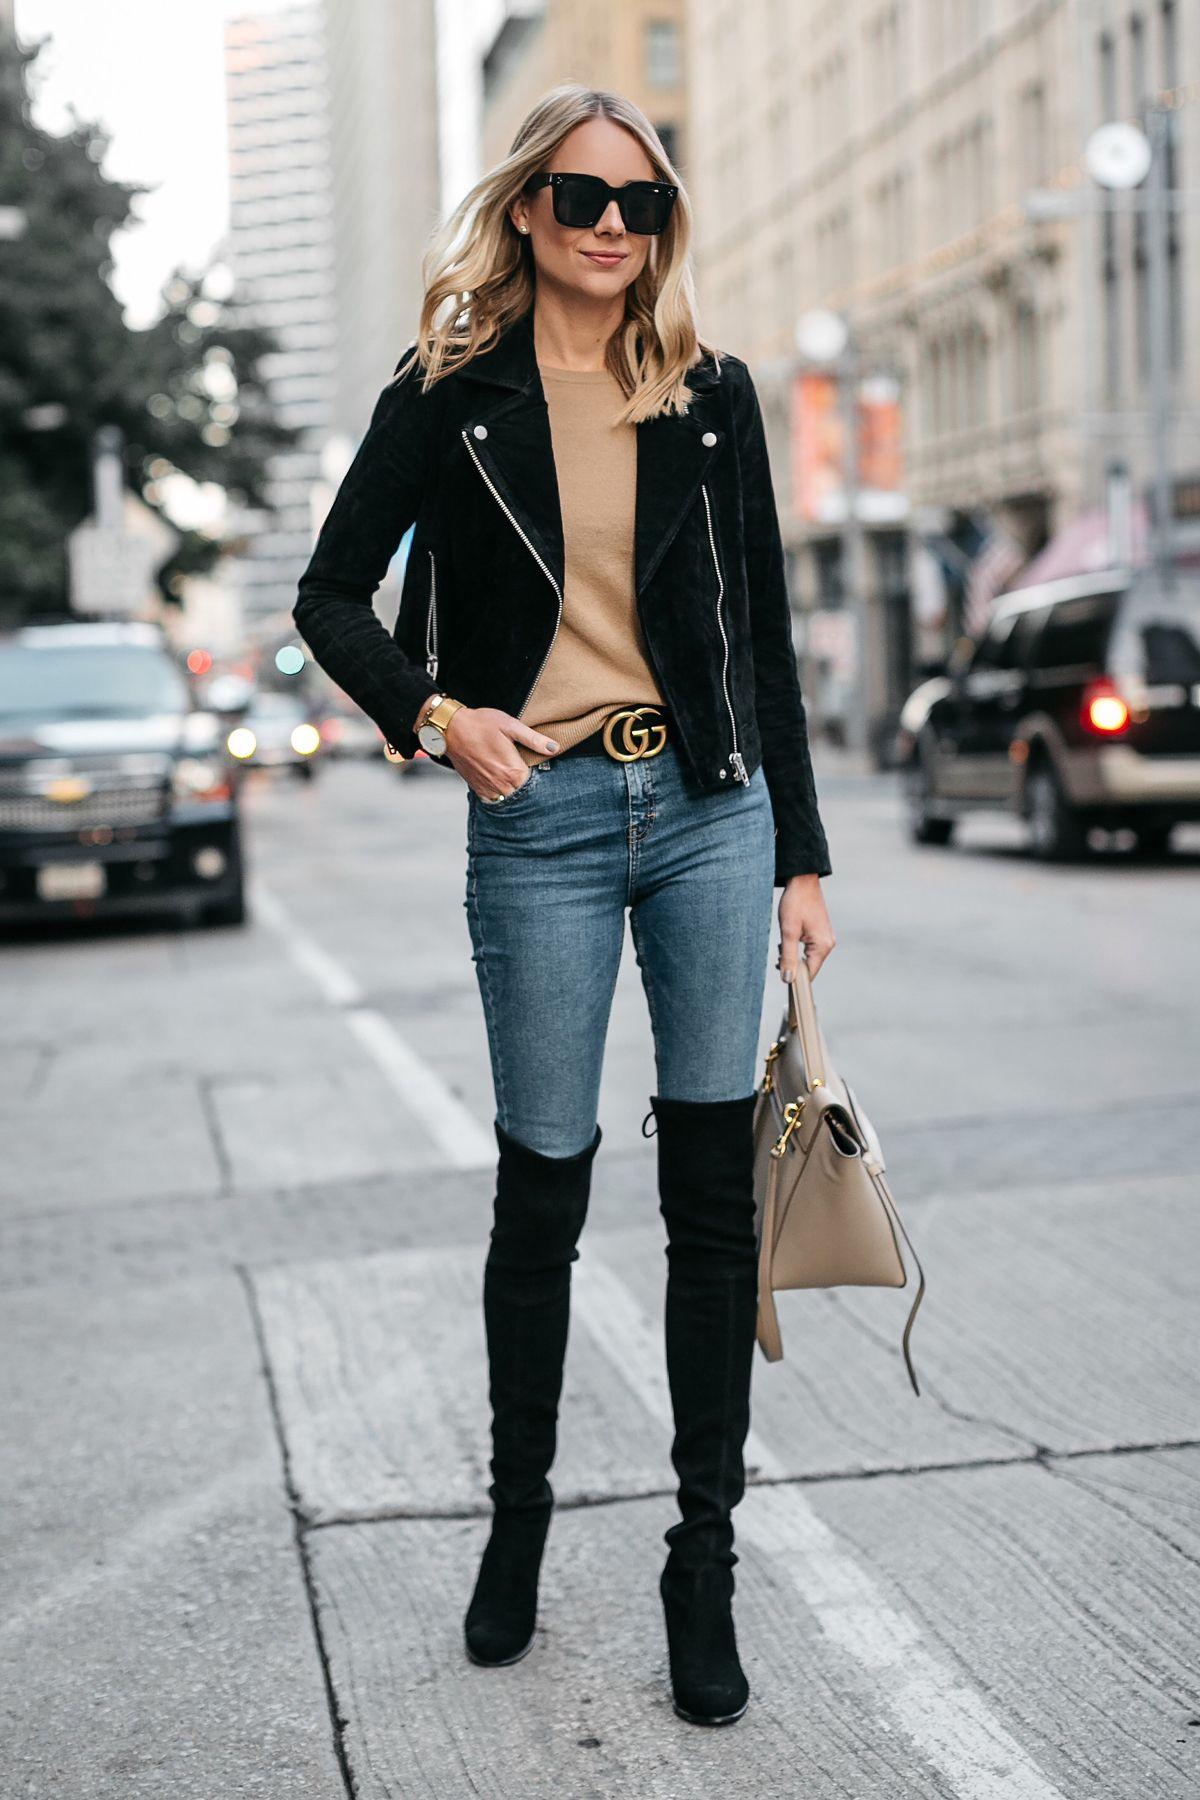 2185e5d35a5b Blonde Woman Wearing Black Suede Moto Jacket Camel Sweater Denim Skinny  Jeans Stuart Weitzman Over-the-Knee boots Gucci Marmont Belt Fashion  Jackson Dallas ...